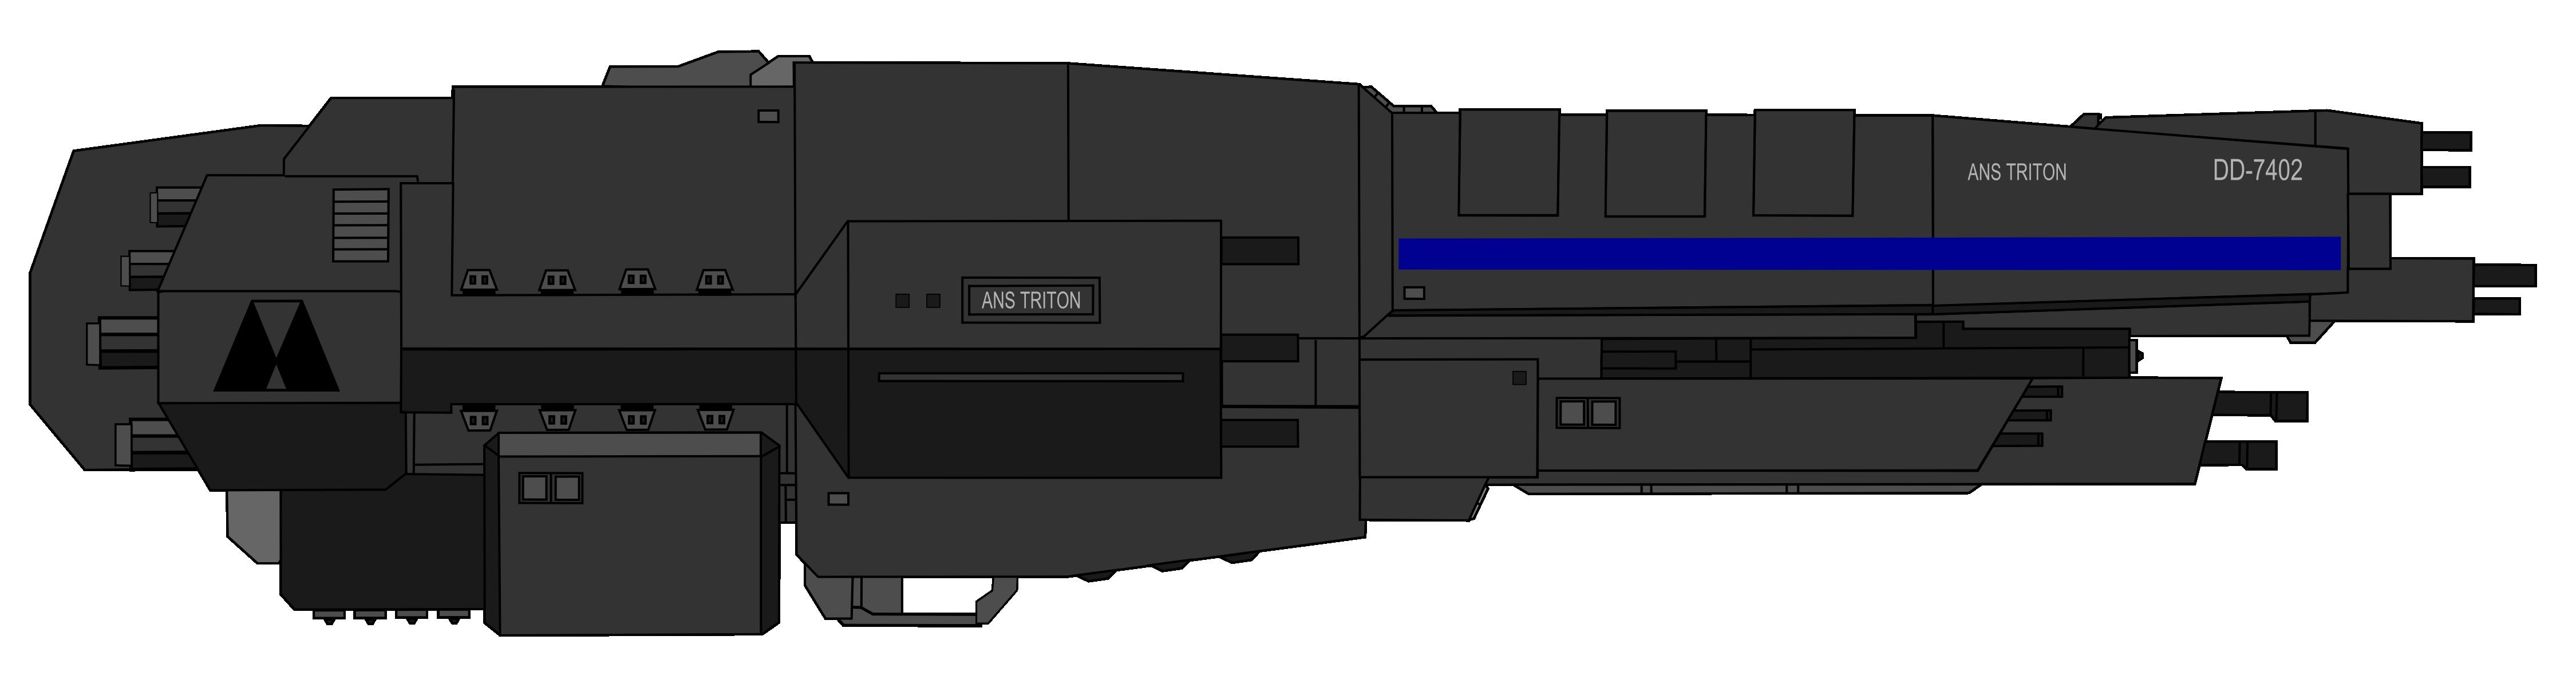 Triton-class destroyer